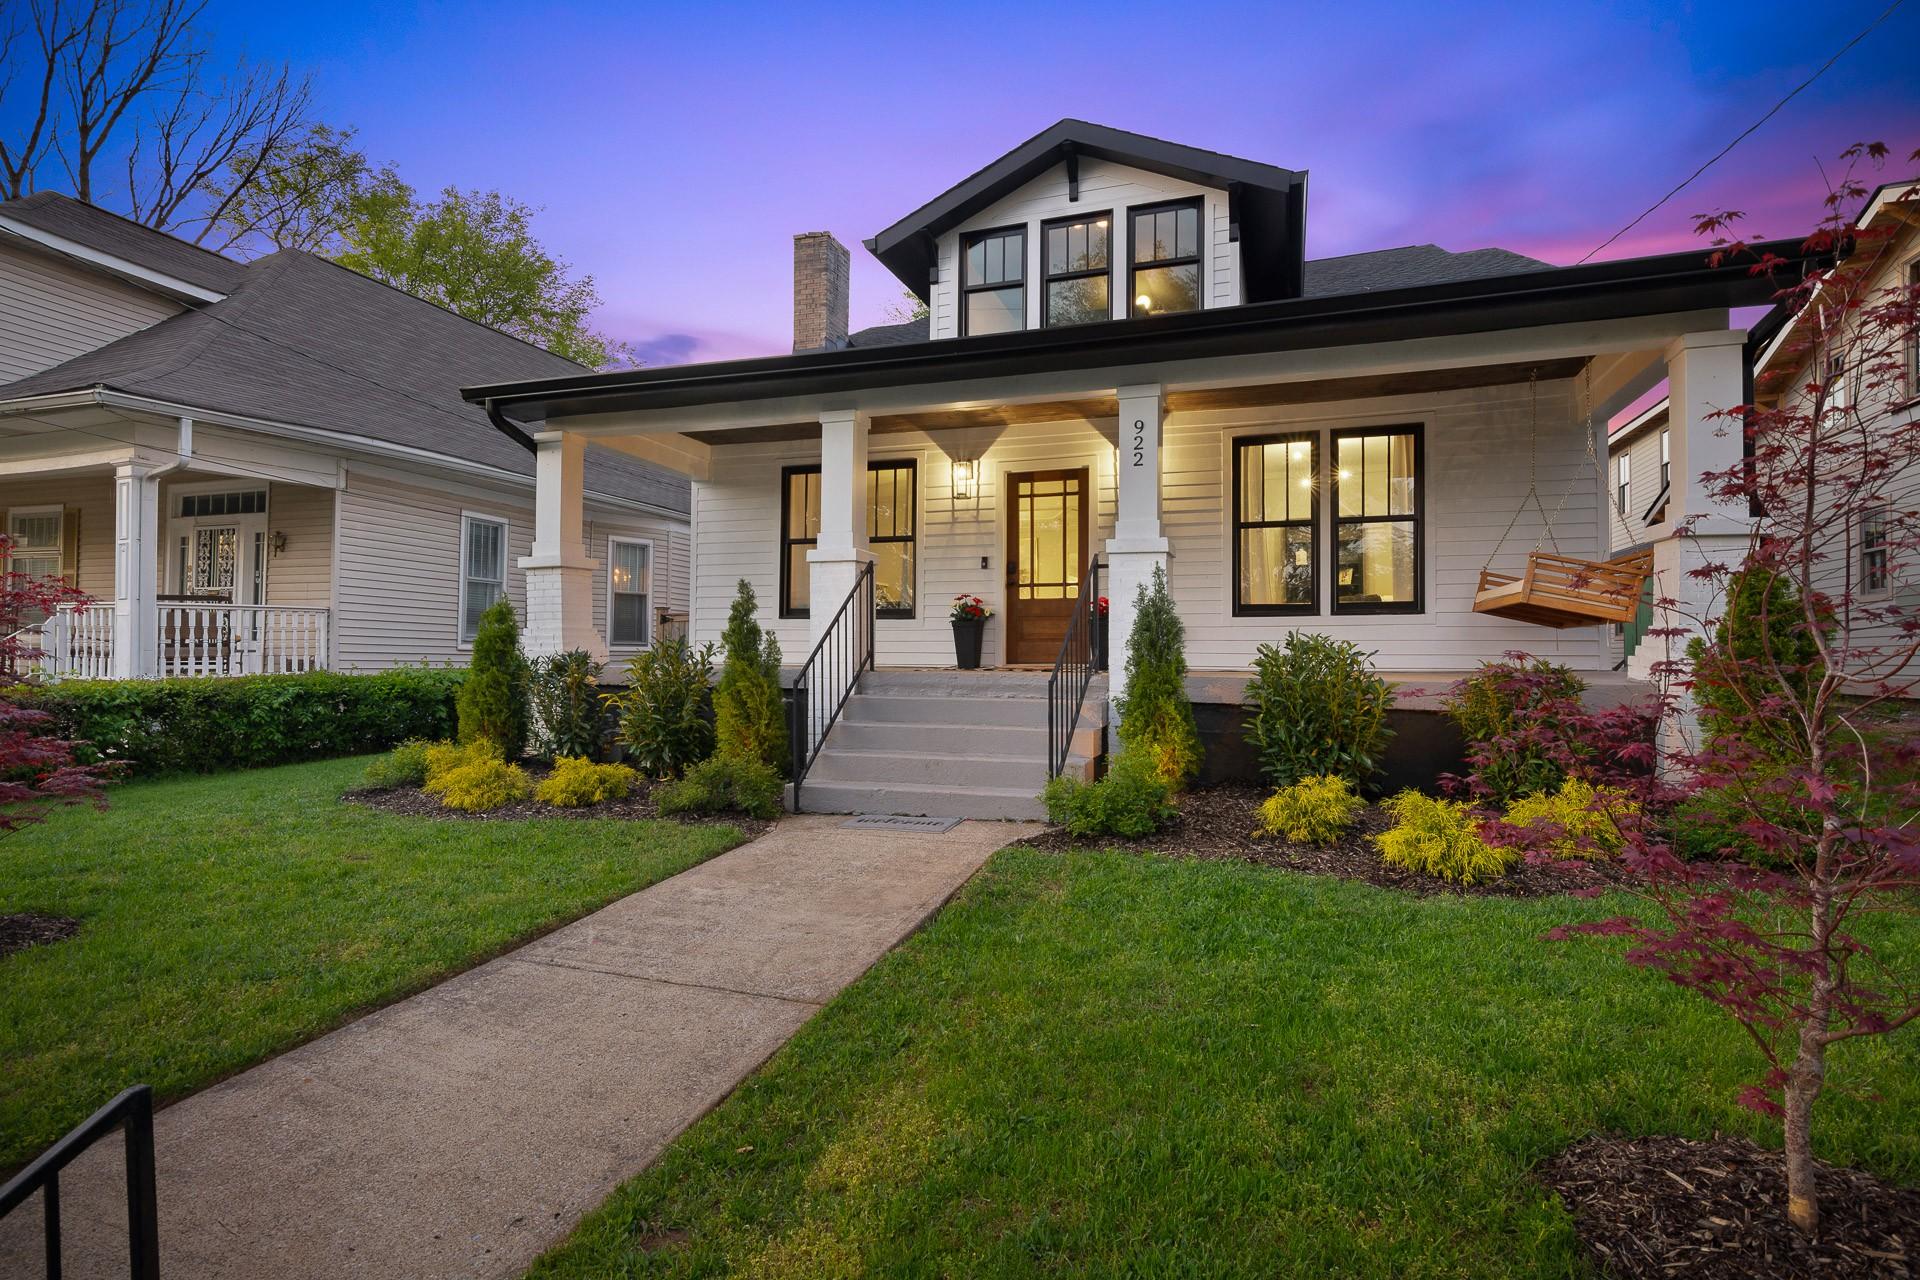 922 Lawrence Ave, Nashville, TN 37204 - Nashville, TN real estate listing